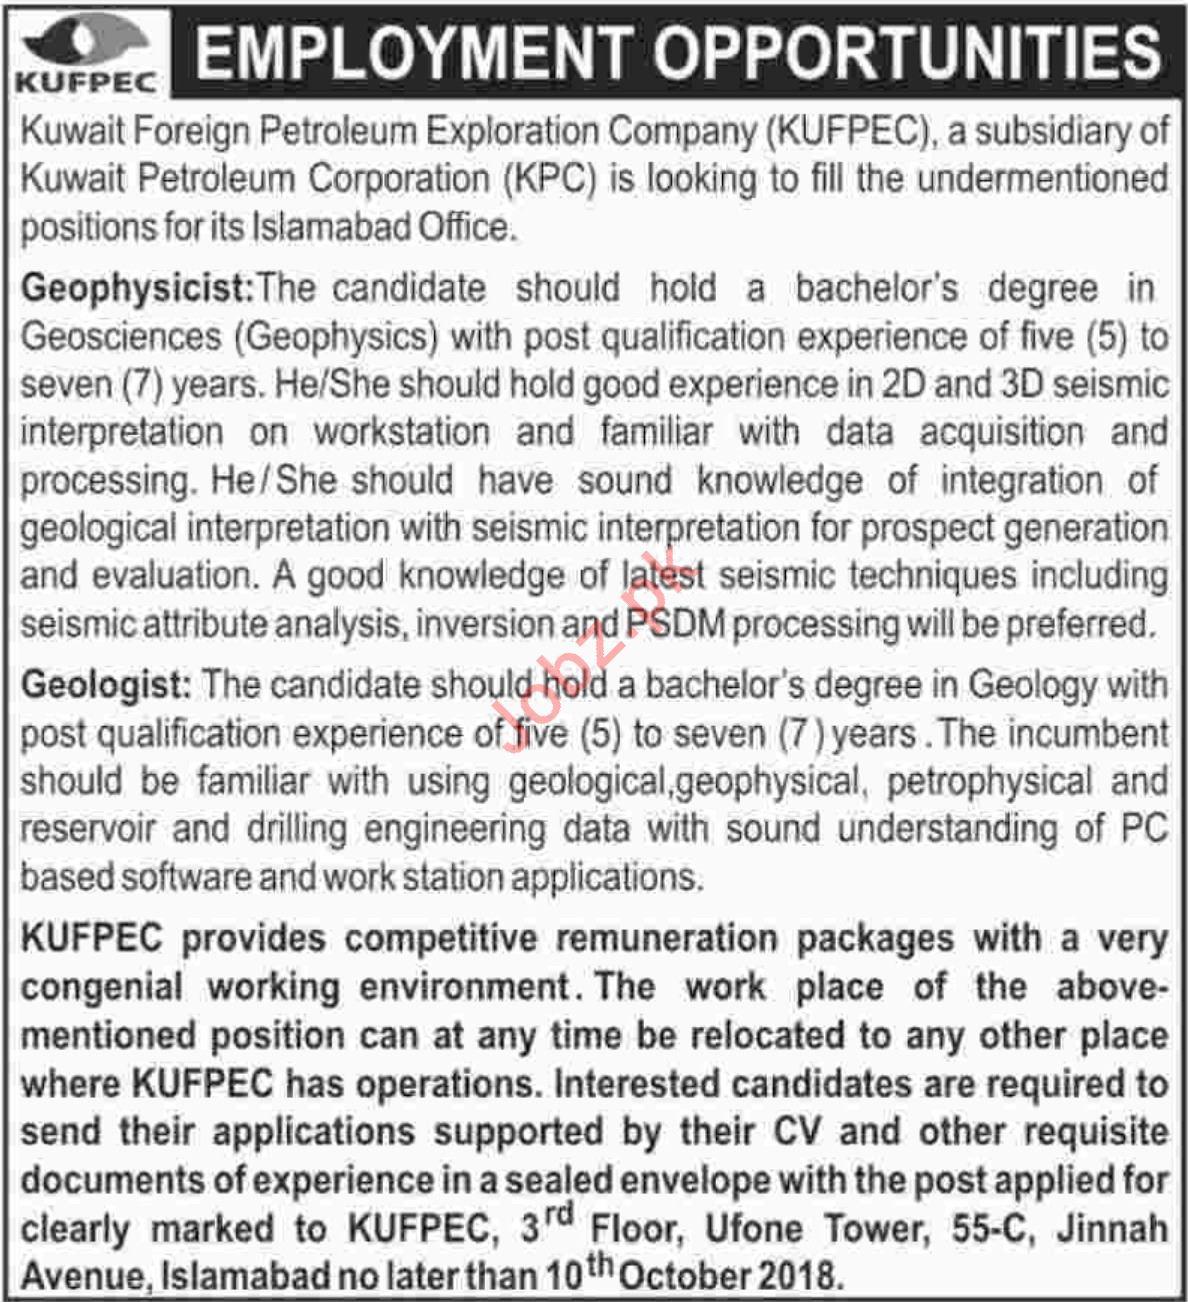 Geophysicist Jobs at KUFPEC